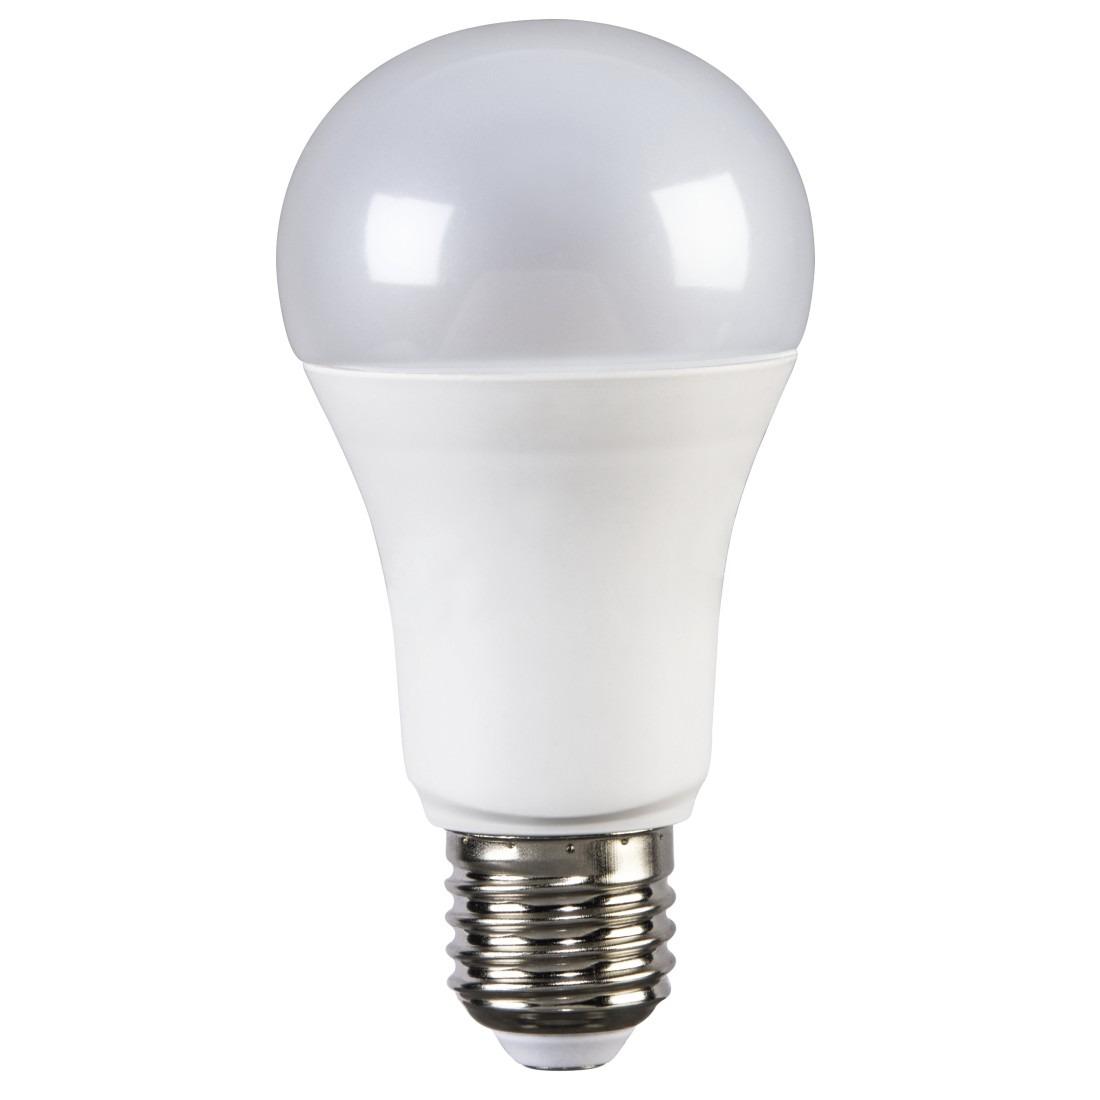 Korting Xavax LED lamp, E27, 1521lm vervangt 100W, gloeilamp dimbaar